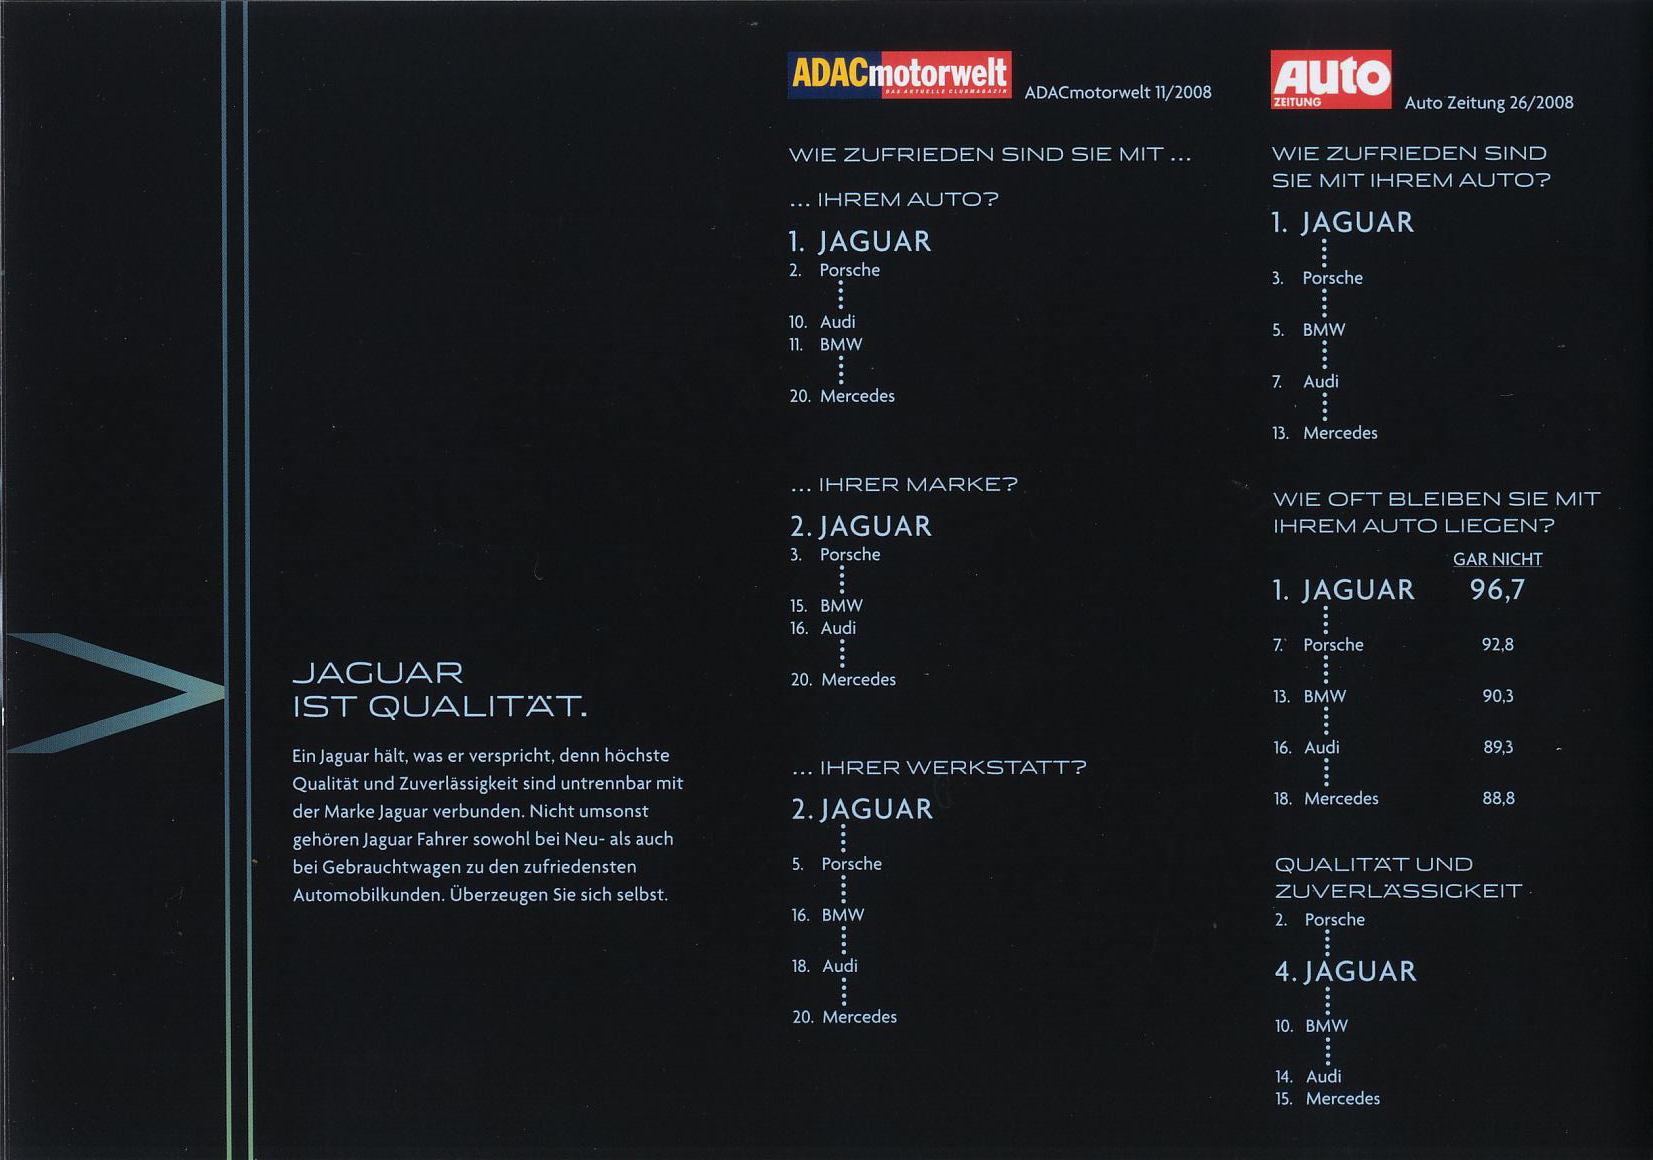 2009 Jaguar Brochure